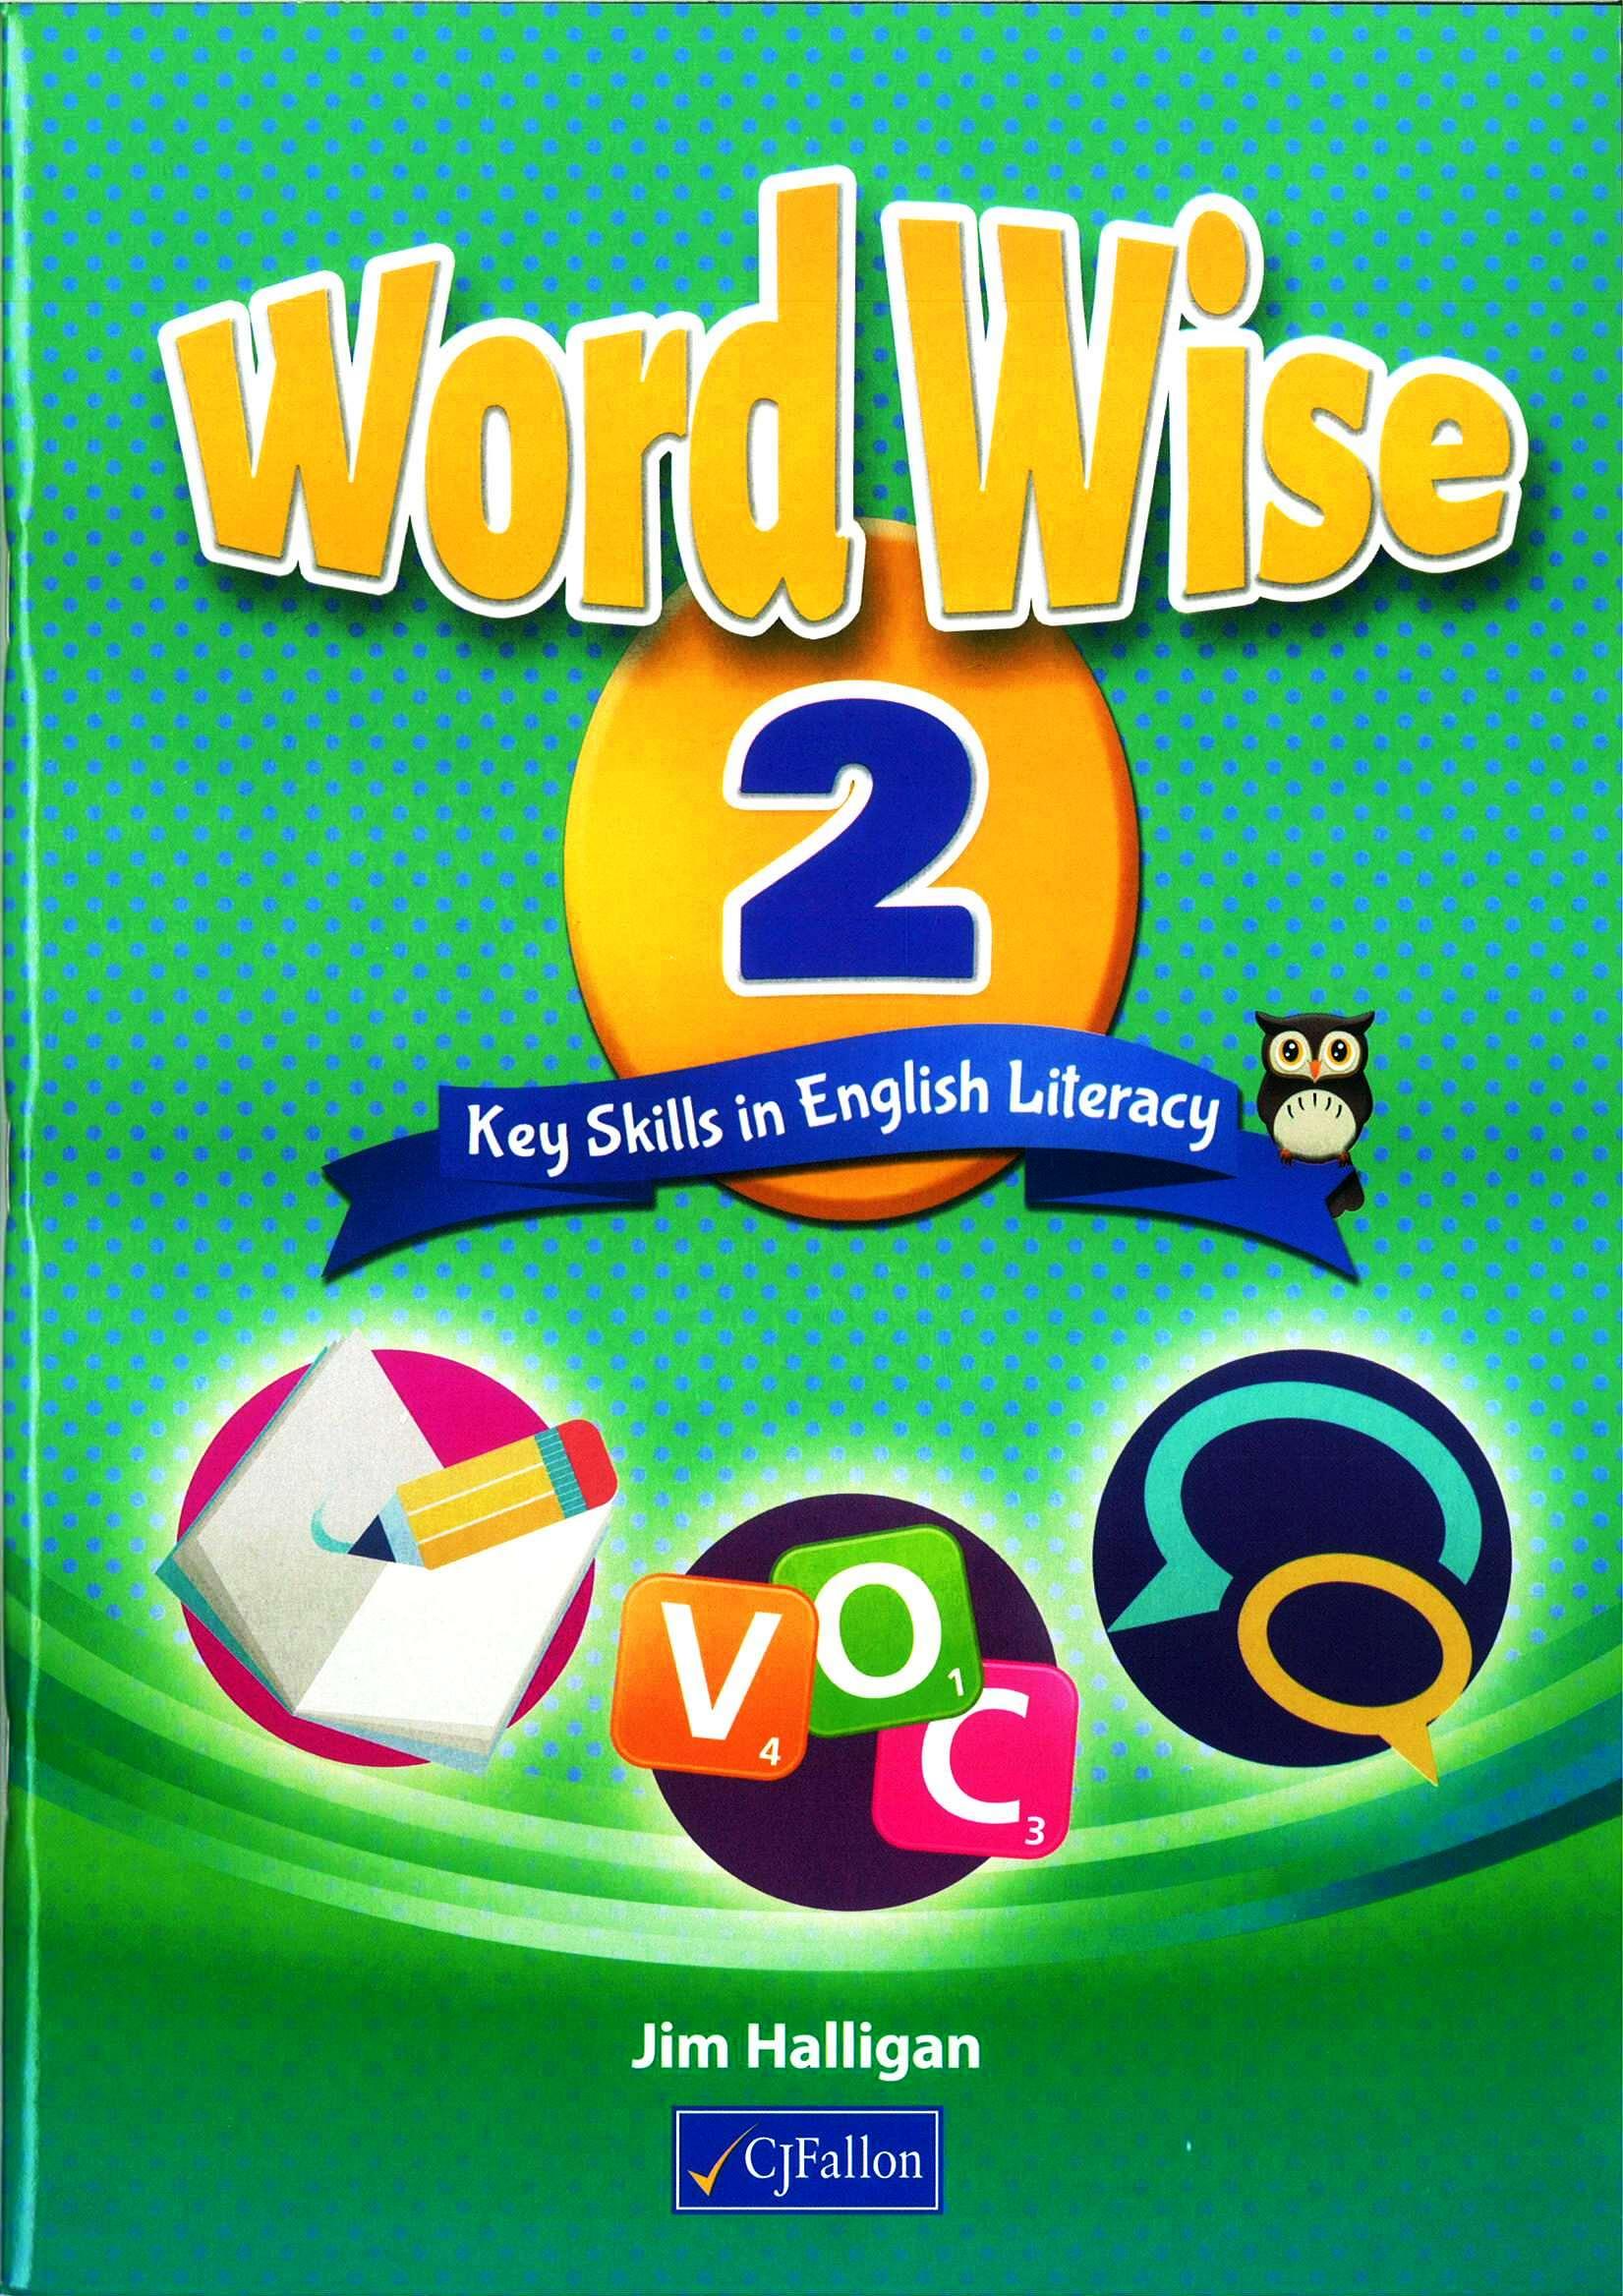 Word Wise 2 - Key Skills In English Literacy 2nd Class School Books